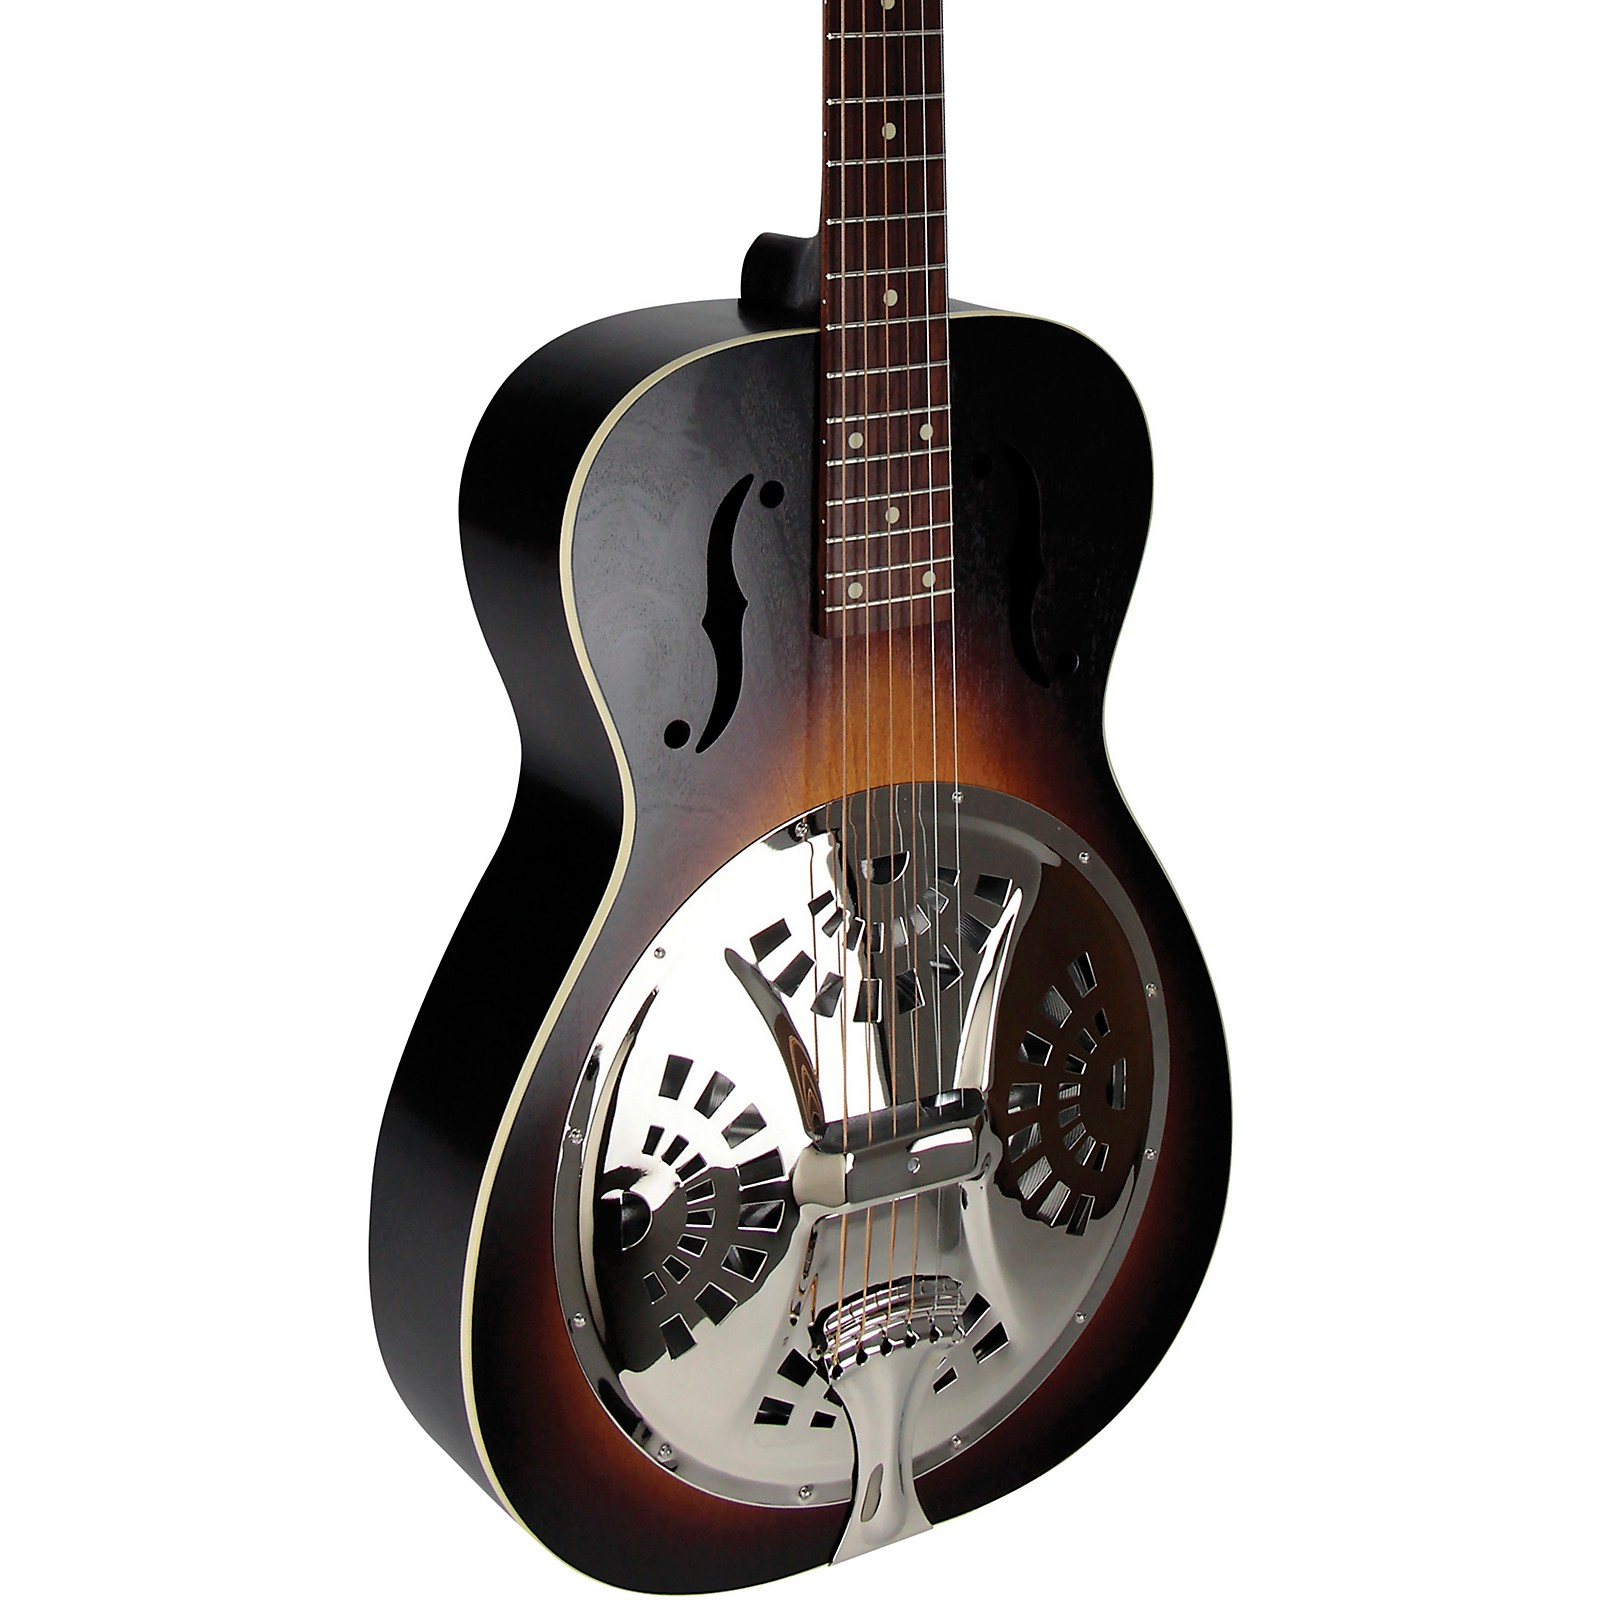 Beard Guitars Deco Phonic Model 27 Roundneck Resonator Guitar